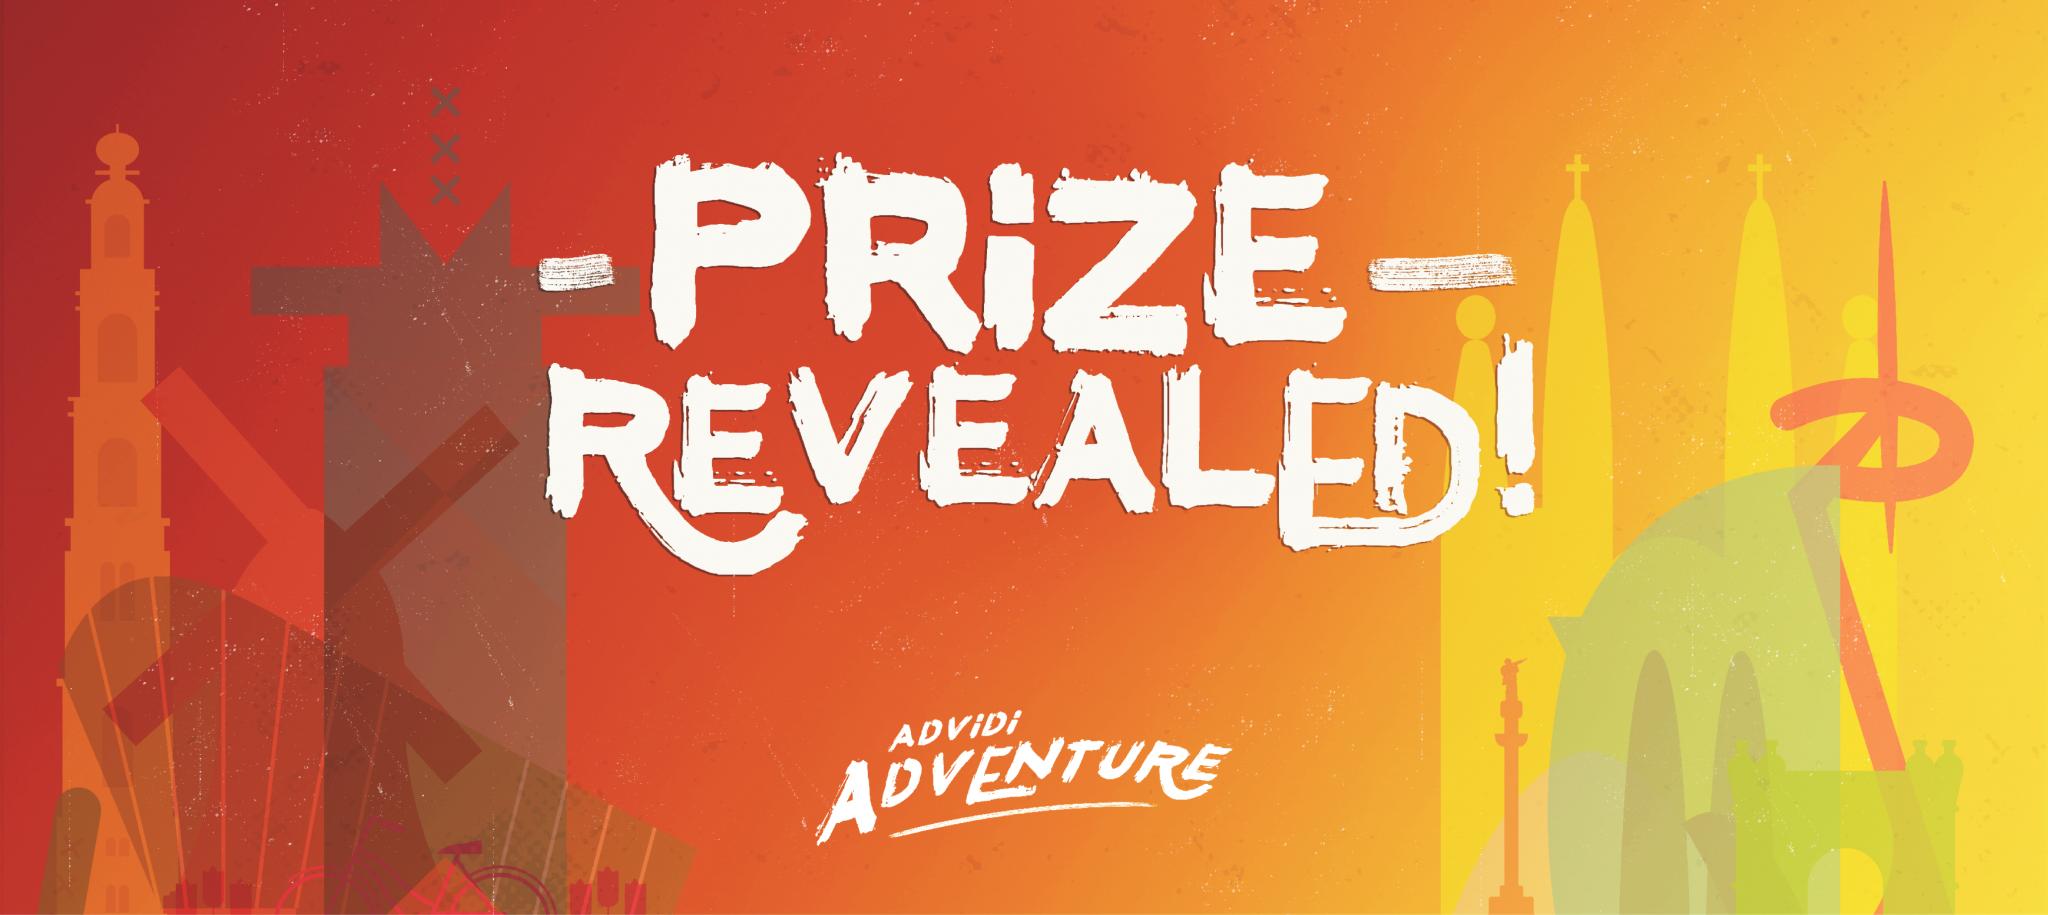 Revealed: The Advidi Adventure Prize (Got FOMO? Don't Read This!)